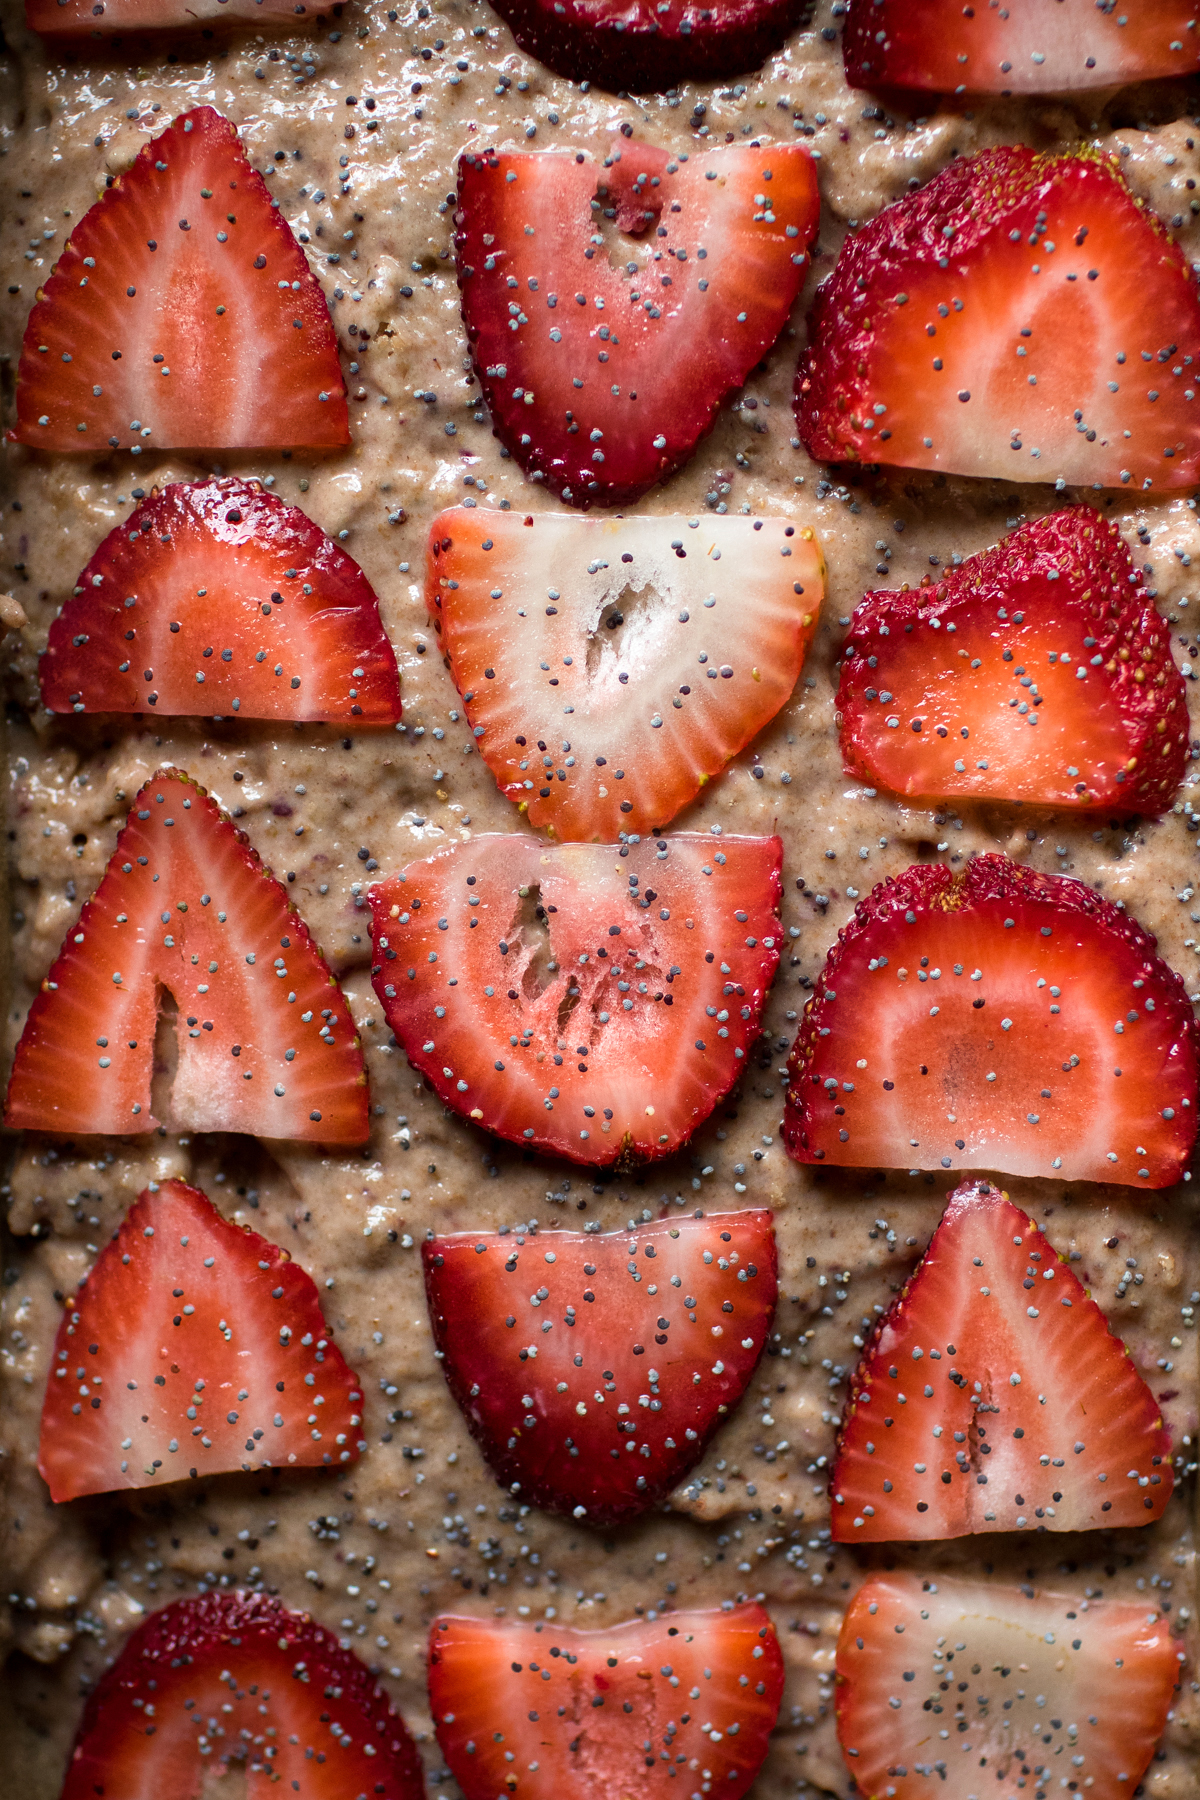 Strawberry & Poppyseed Buttermilk Bread